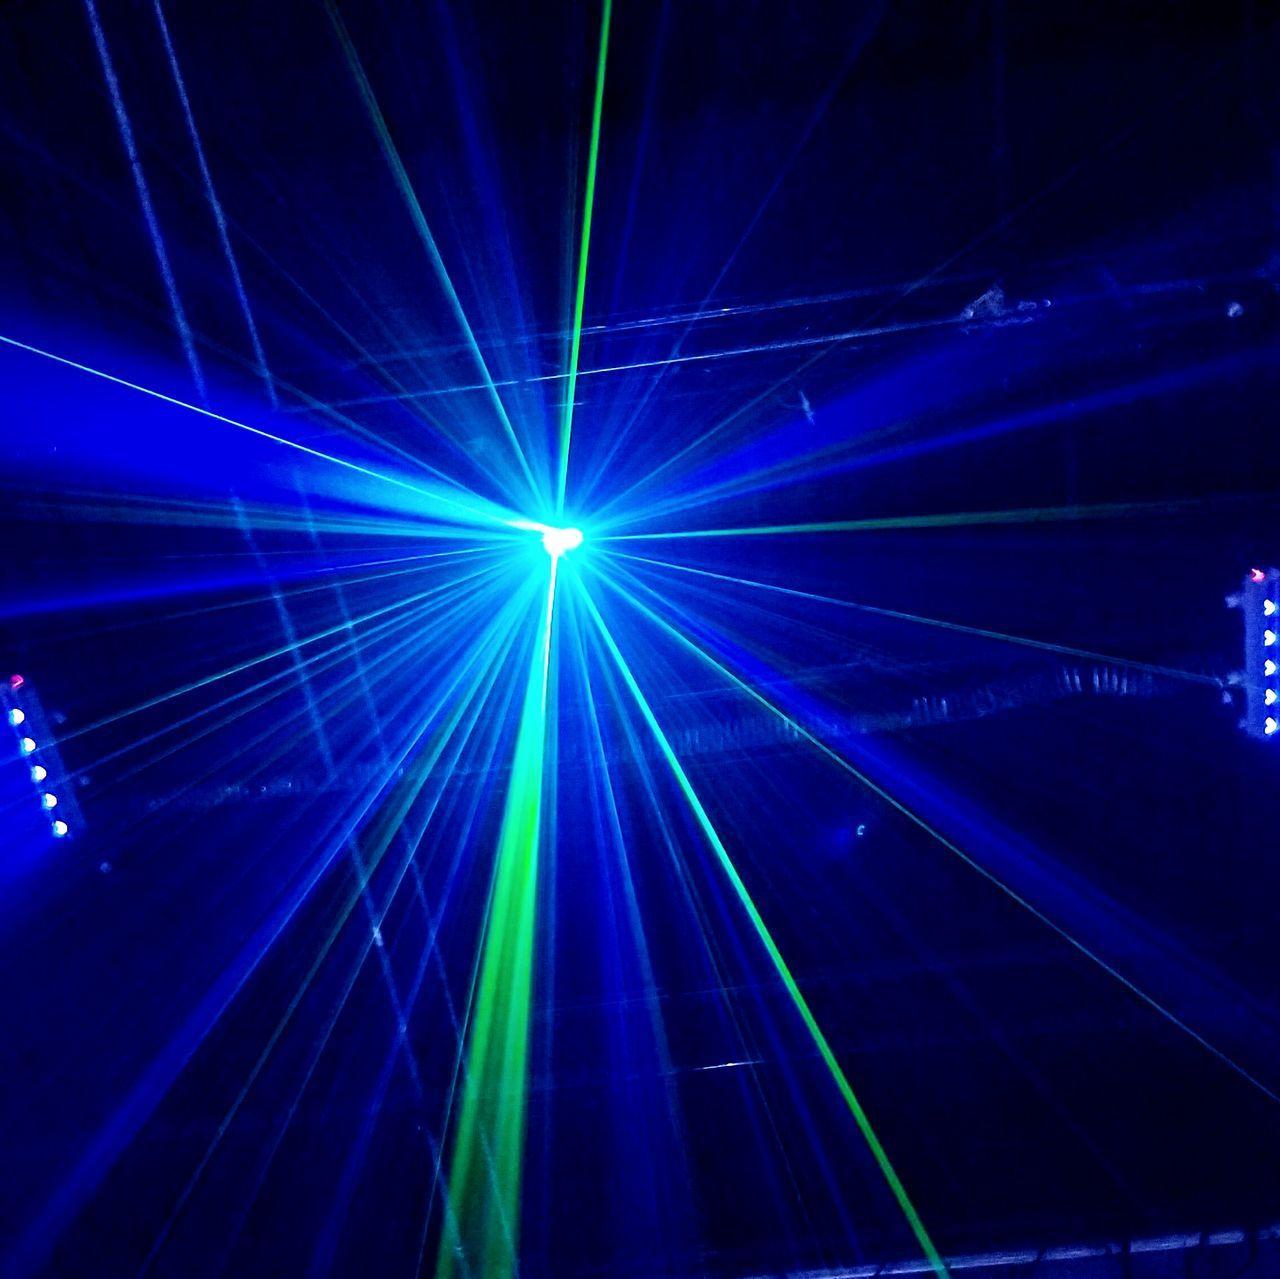 arts culture and entertainment, blue, indoors, nightlife, laser, illuminated, night, light beam, no people, nightclub